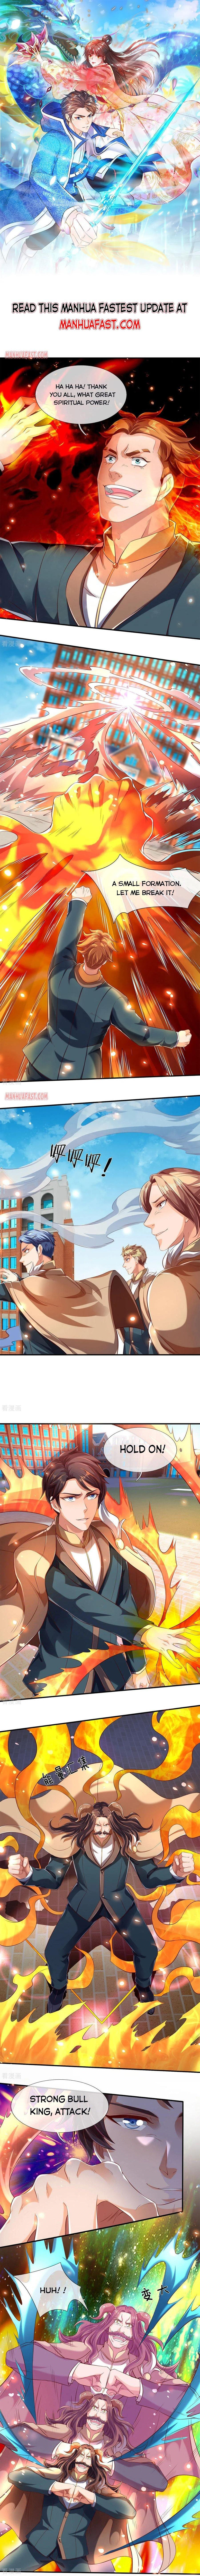 https://manga.mangadogs.com/comics/pic4/39/32615/2916902/a4d2b8d1898773a01997ccfa06051078.jpg Page 1